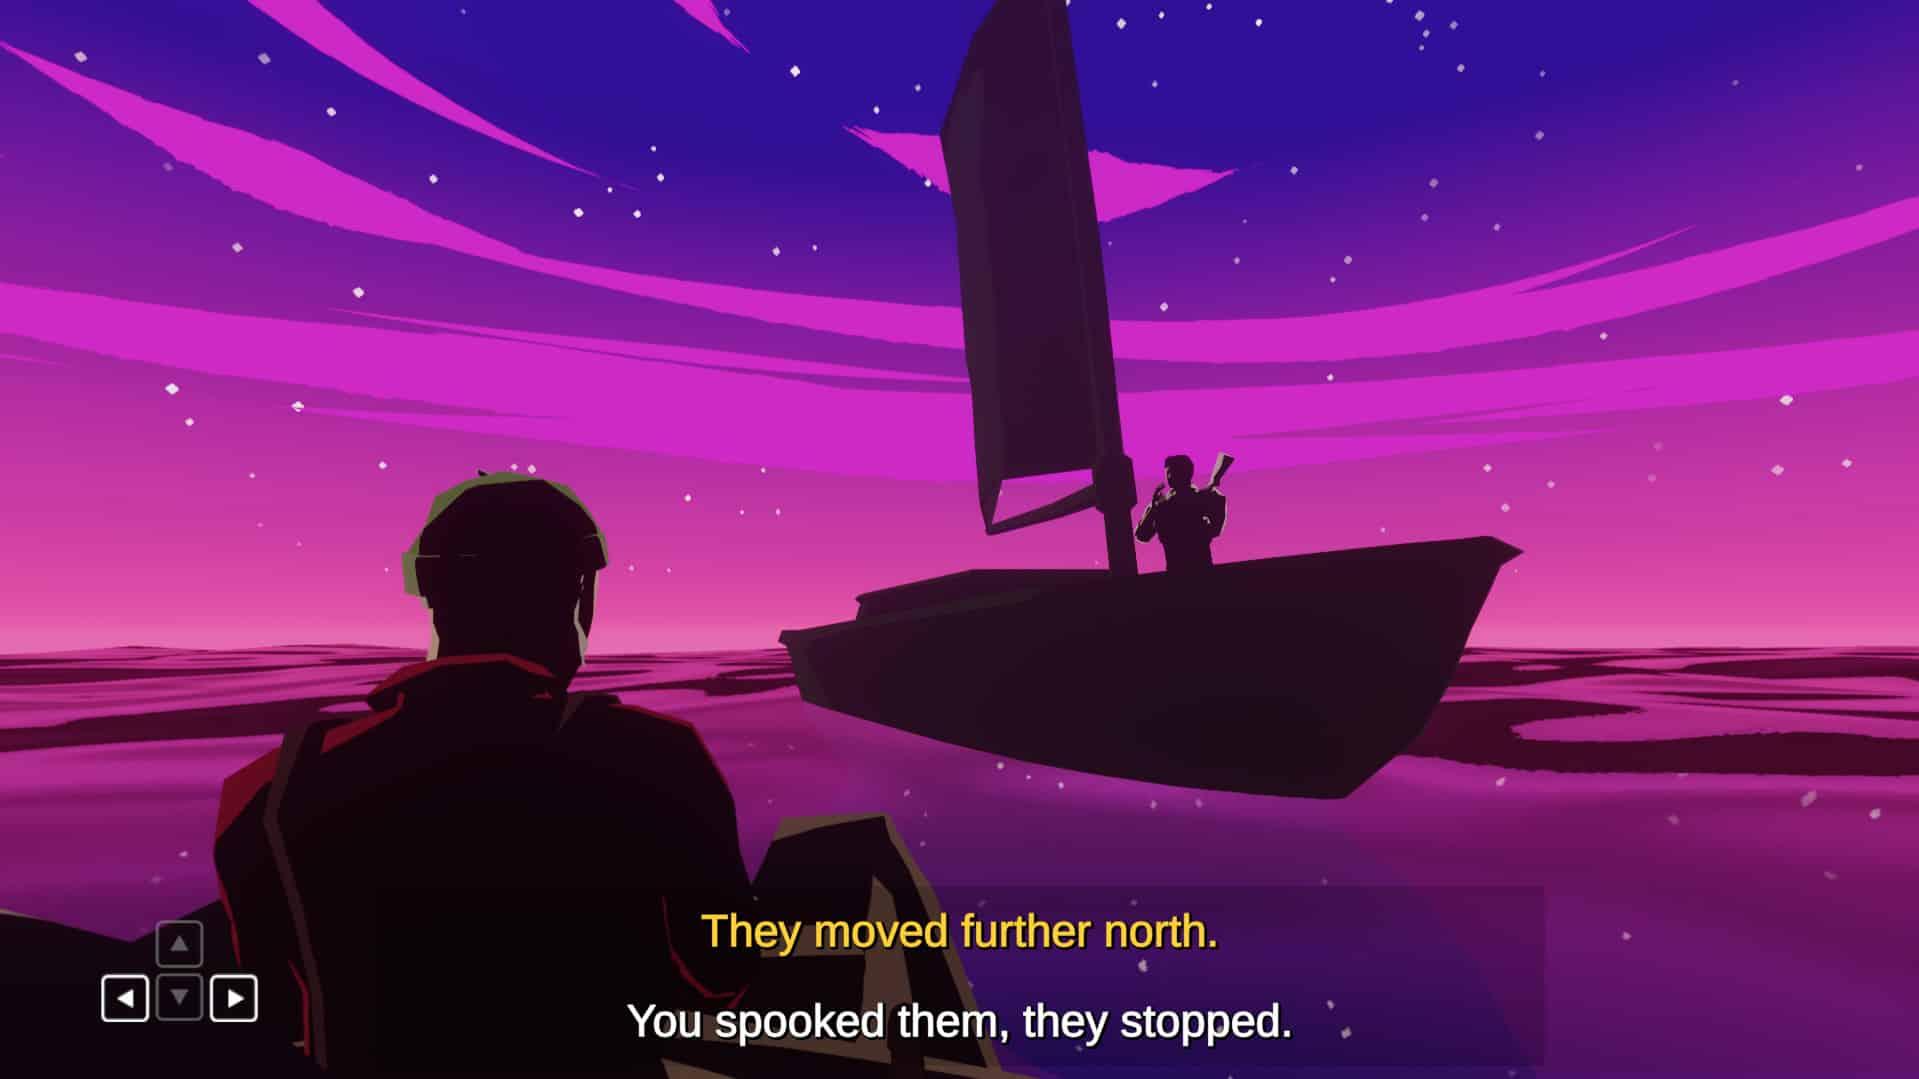 The Night Fisherman Far Few Giants free confrontation narrative game